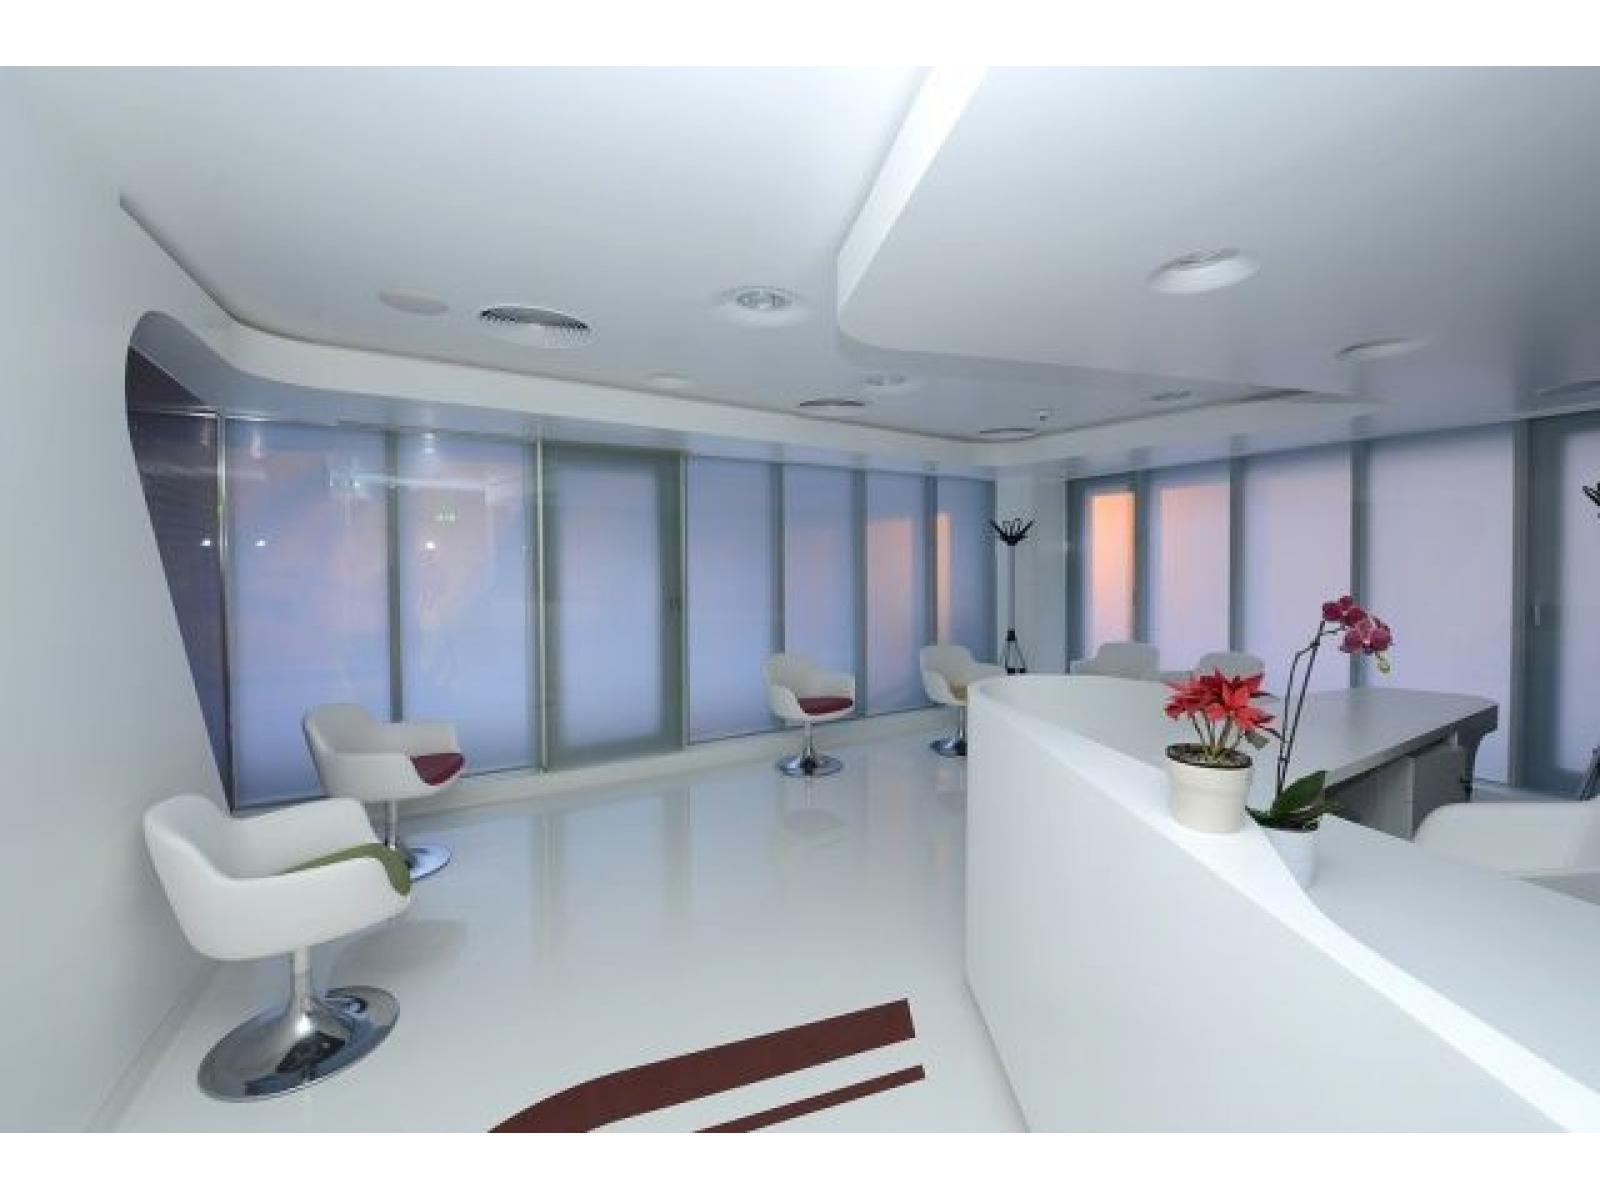 Clinica Zetta - 3_Clinica_zetta_chirurgie_reconstructiva_640_427_95.jpg